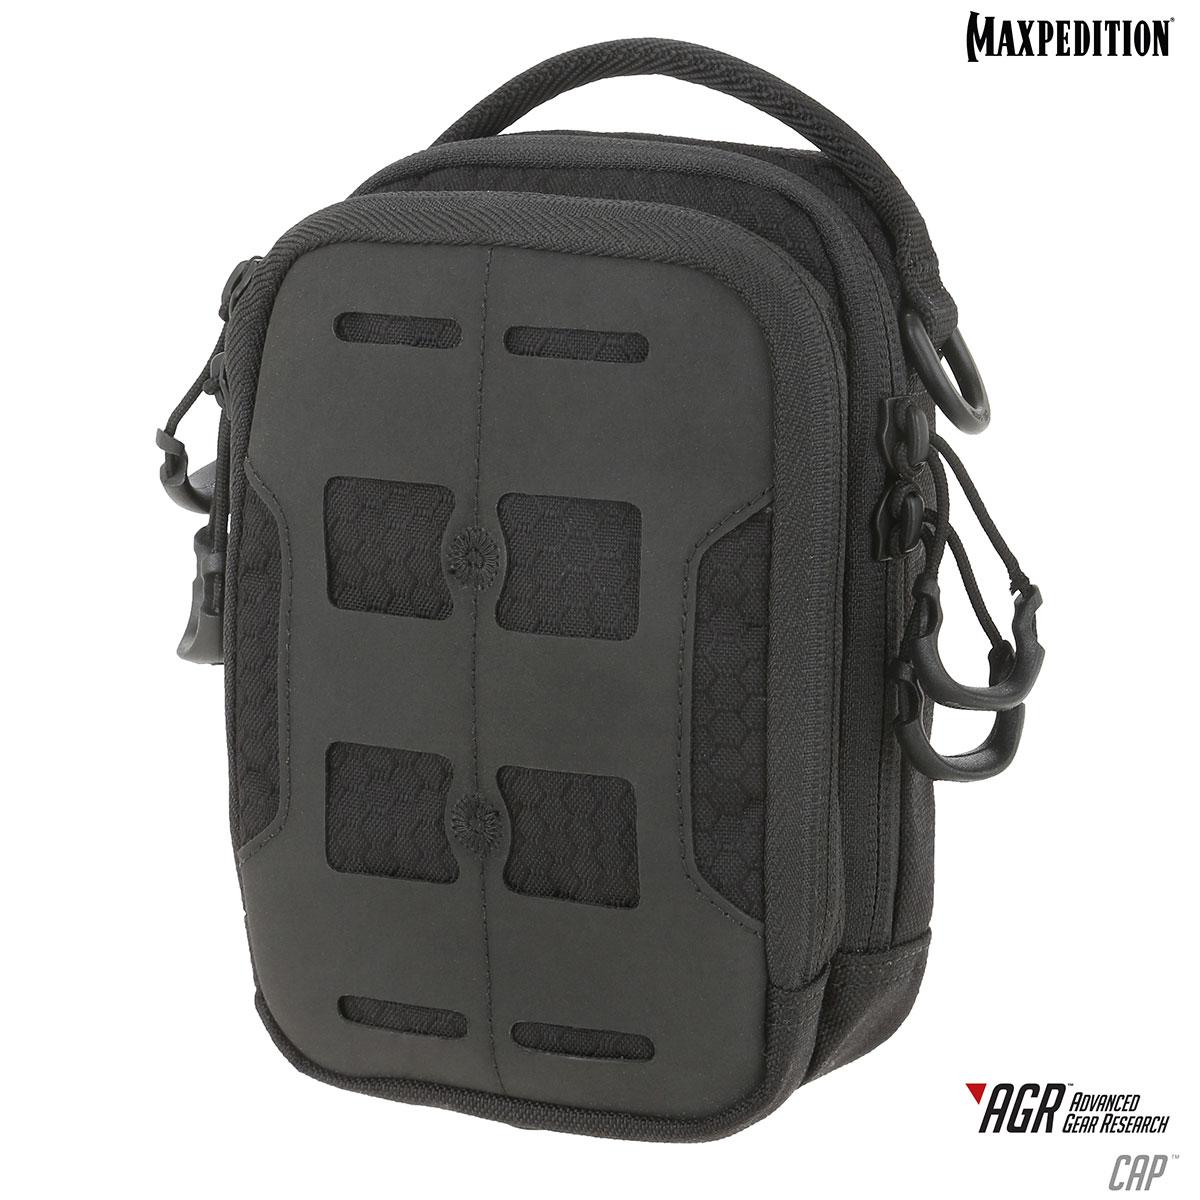 Maxpedition CAP™ Compact Admin Pouch Black